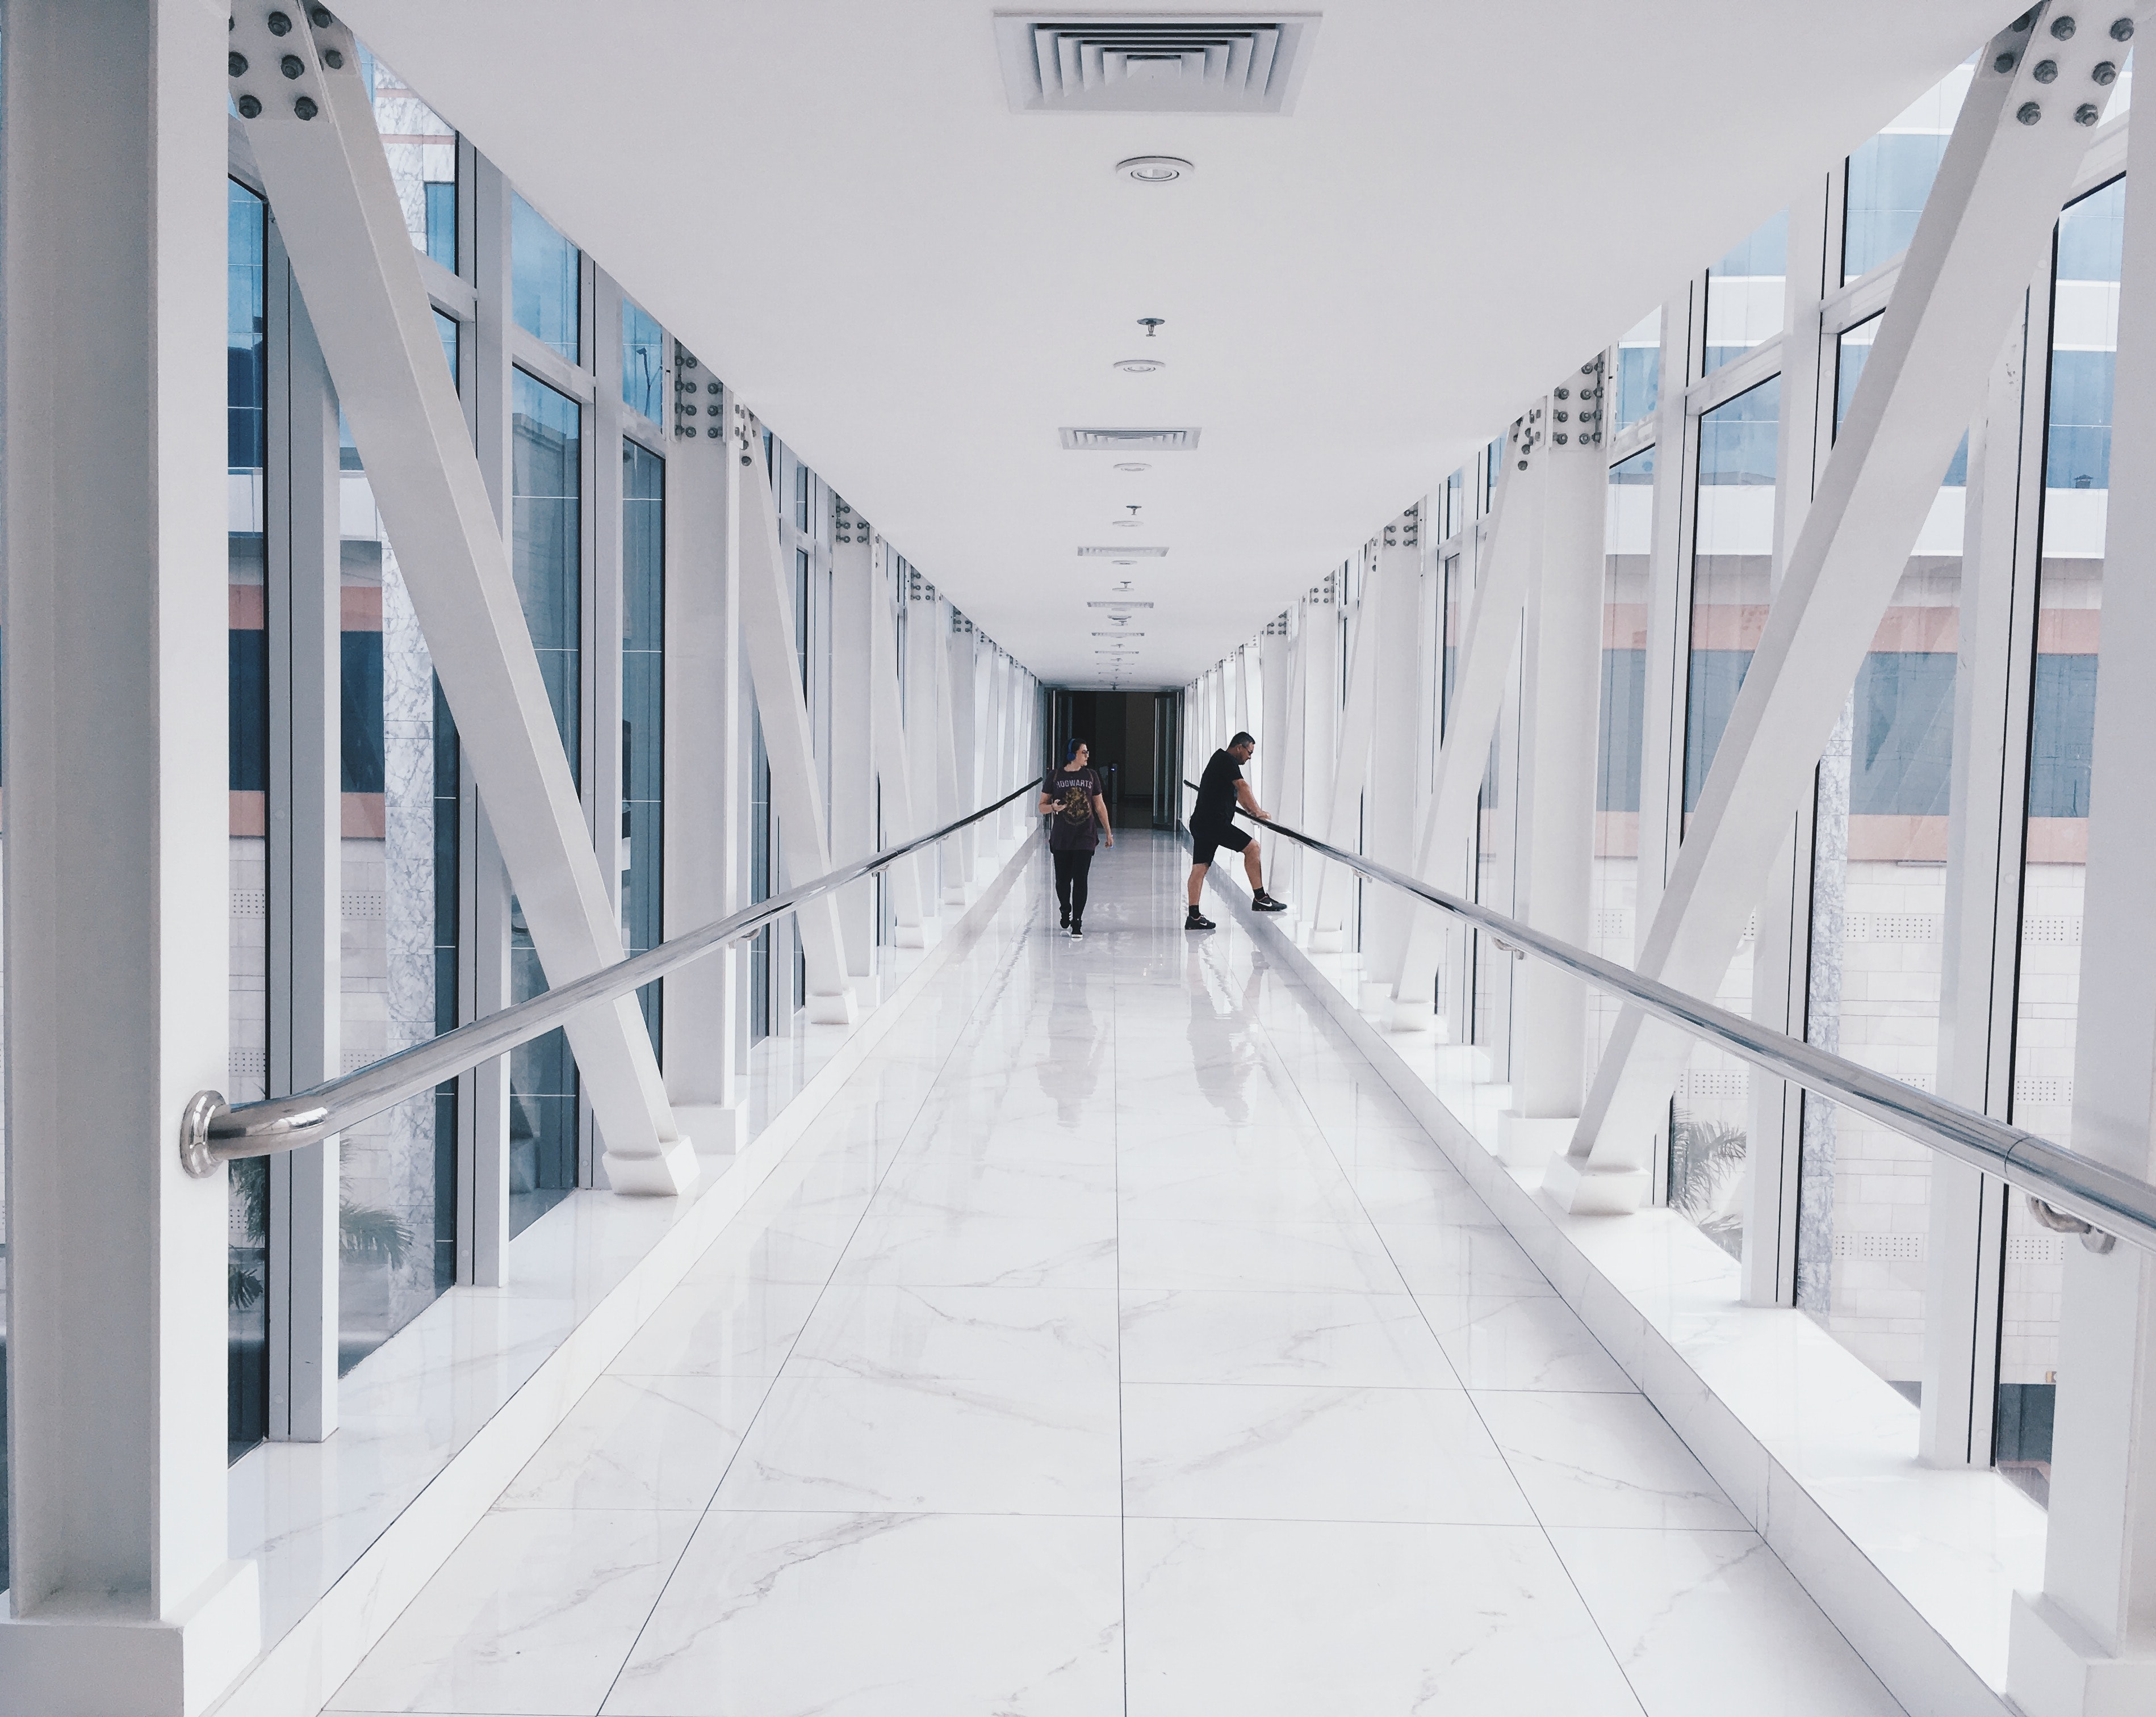 Two People Standing on Hallway Near Glass Window, Architecture, Man, Windows, White, HQ Photo